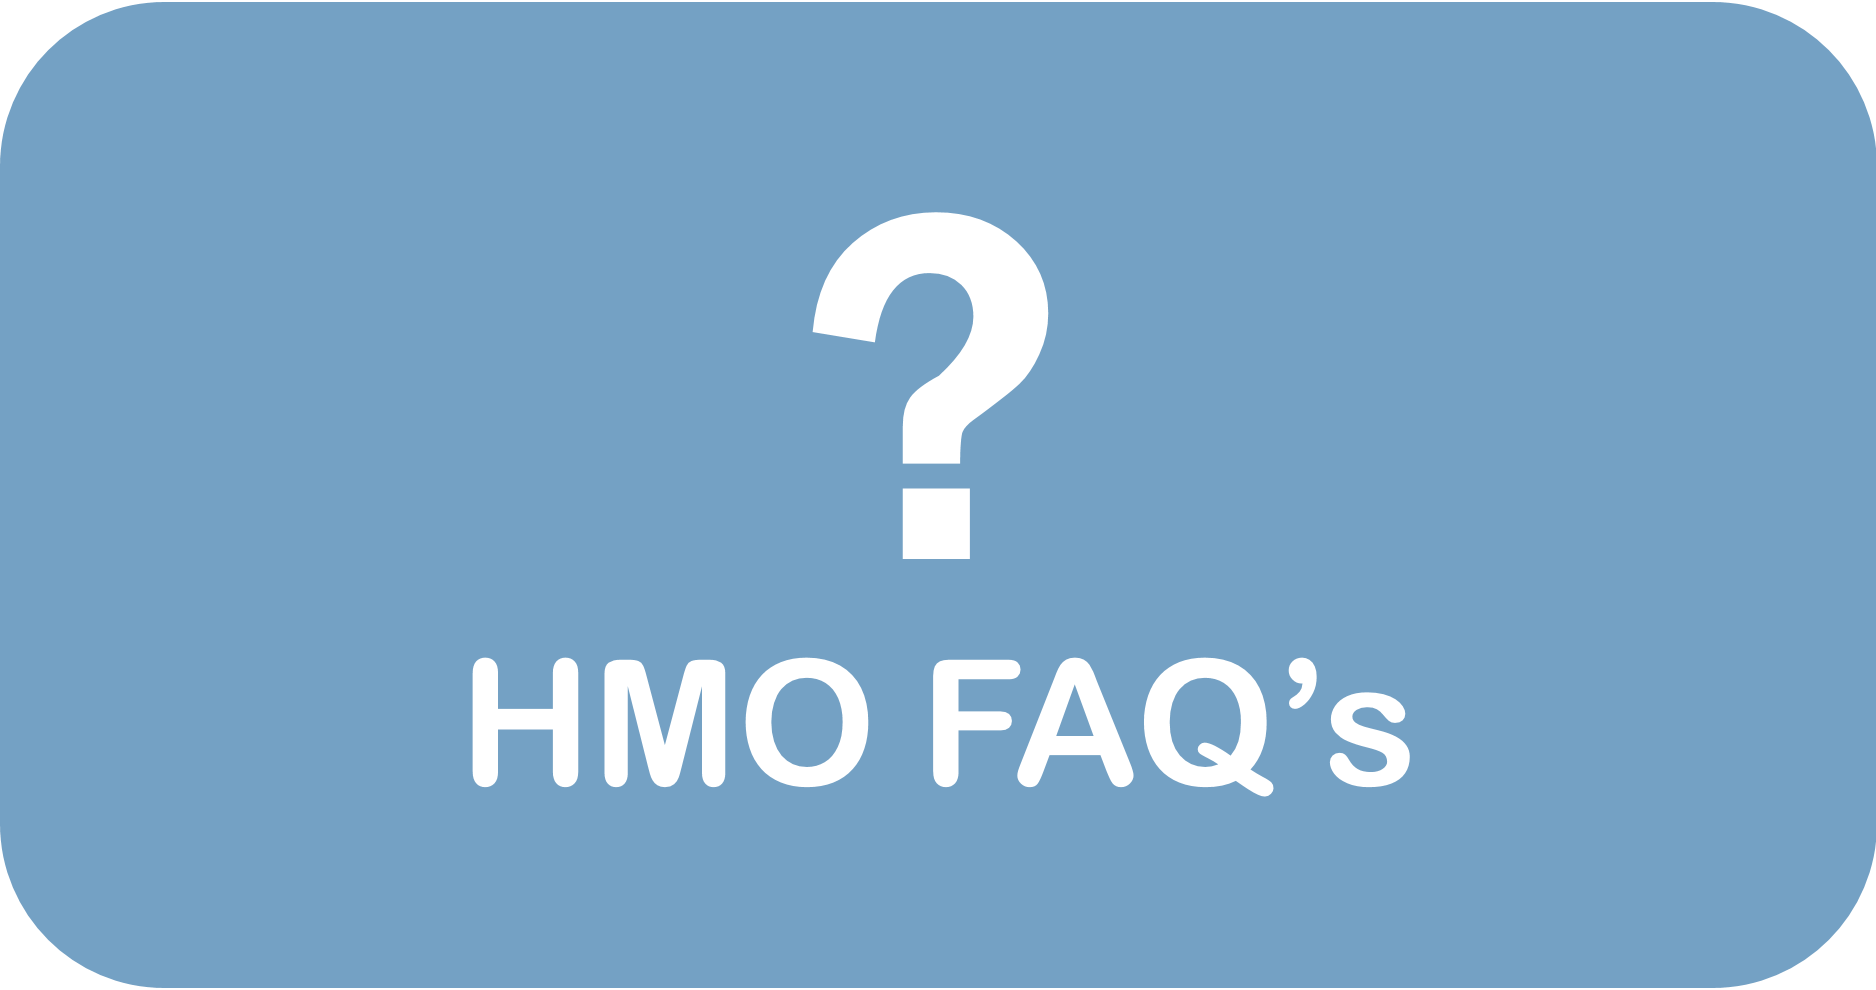 HMO FAQs